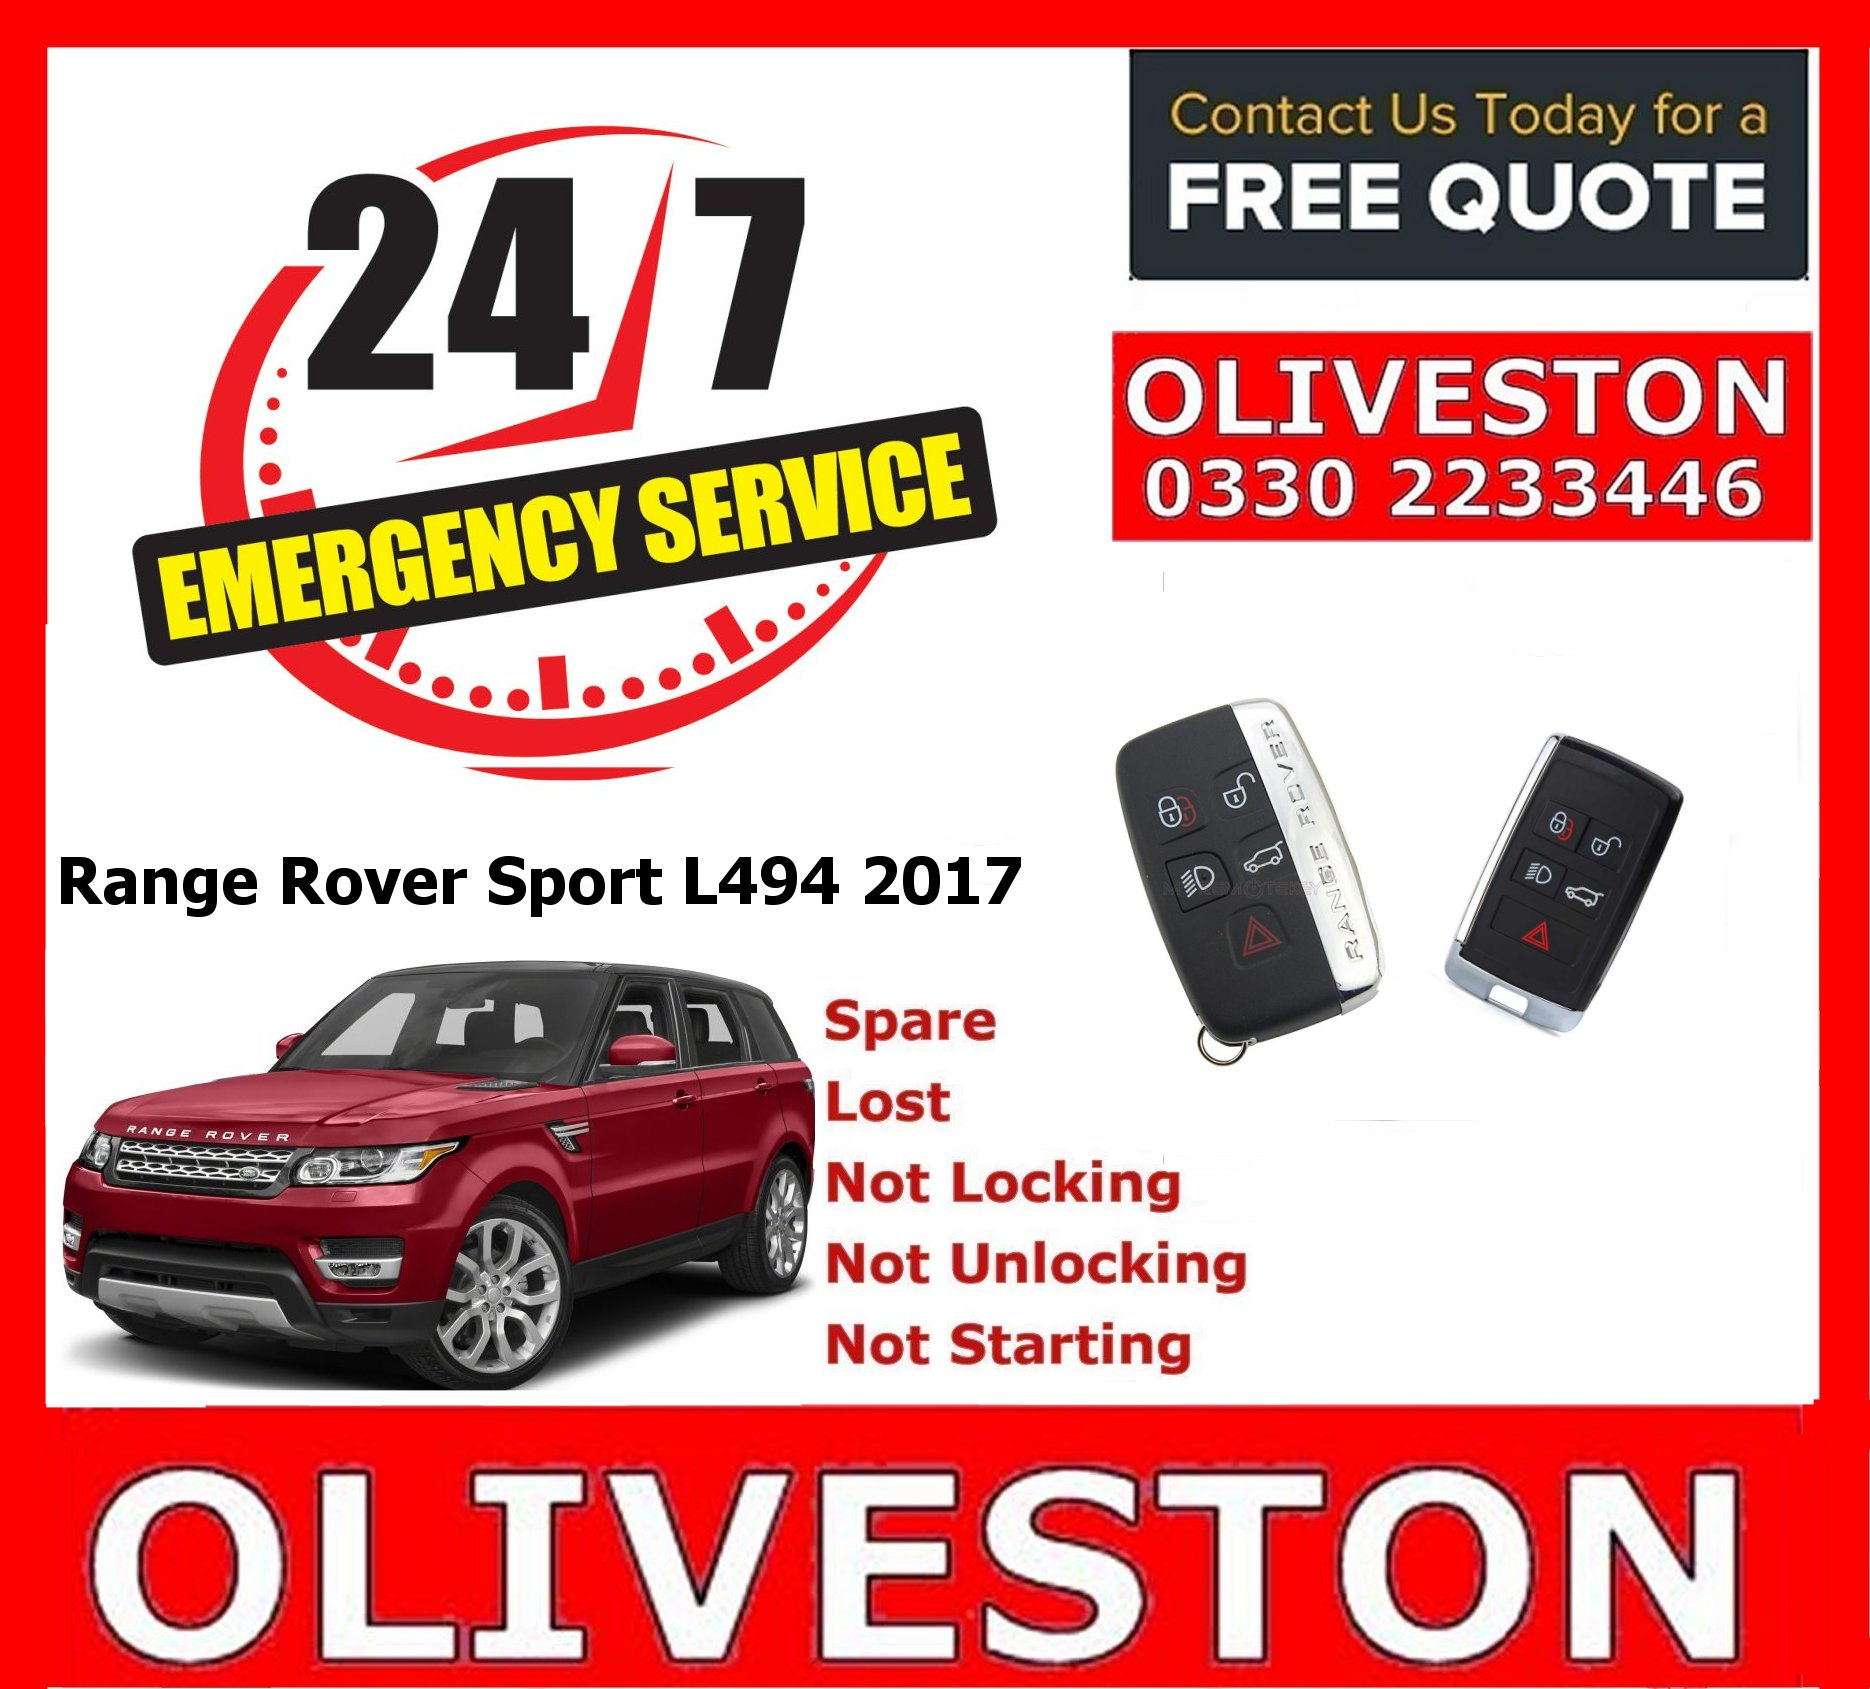 Range Rover Land Rover Jaguar Spare lost keys Arbroath Forfar Montrose Angus Scotland